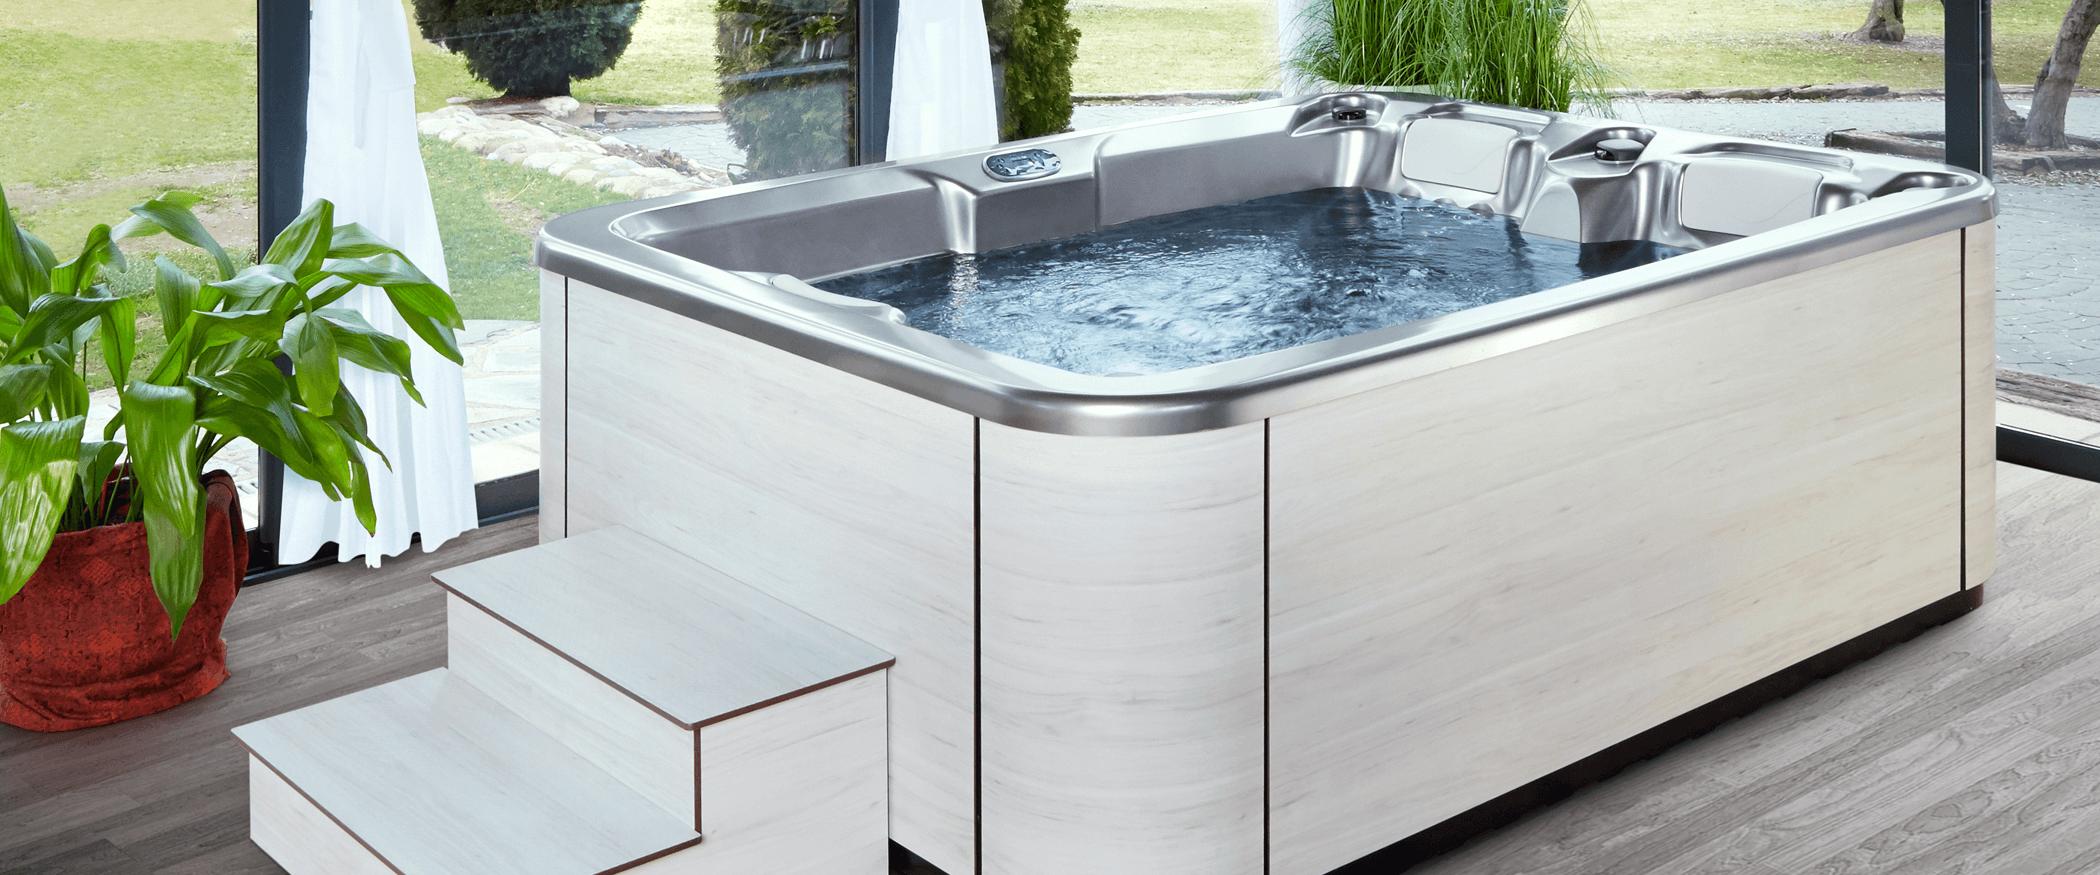 Jacuzzi Triangular.Buy The Compact Hot Tub Touch Aquavia Spa